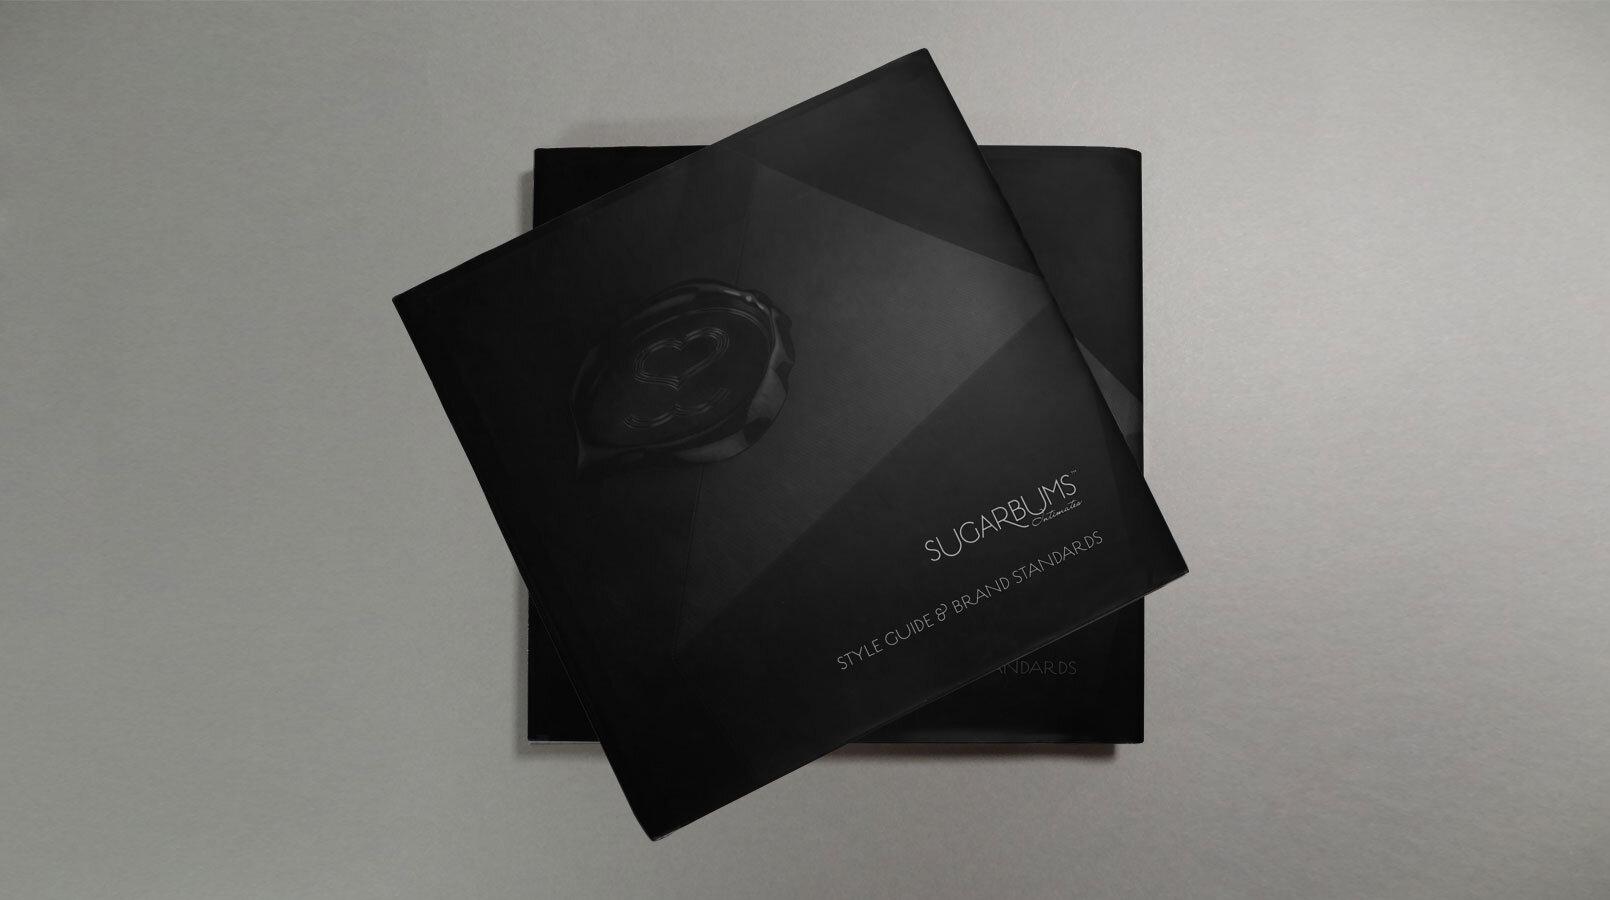 Sugarbums-Intimates-Contical-Packaging-Branding-Company-Design-9.jpg